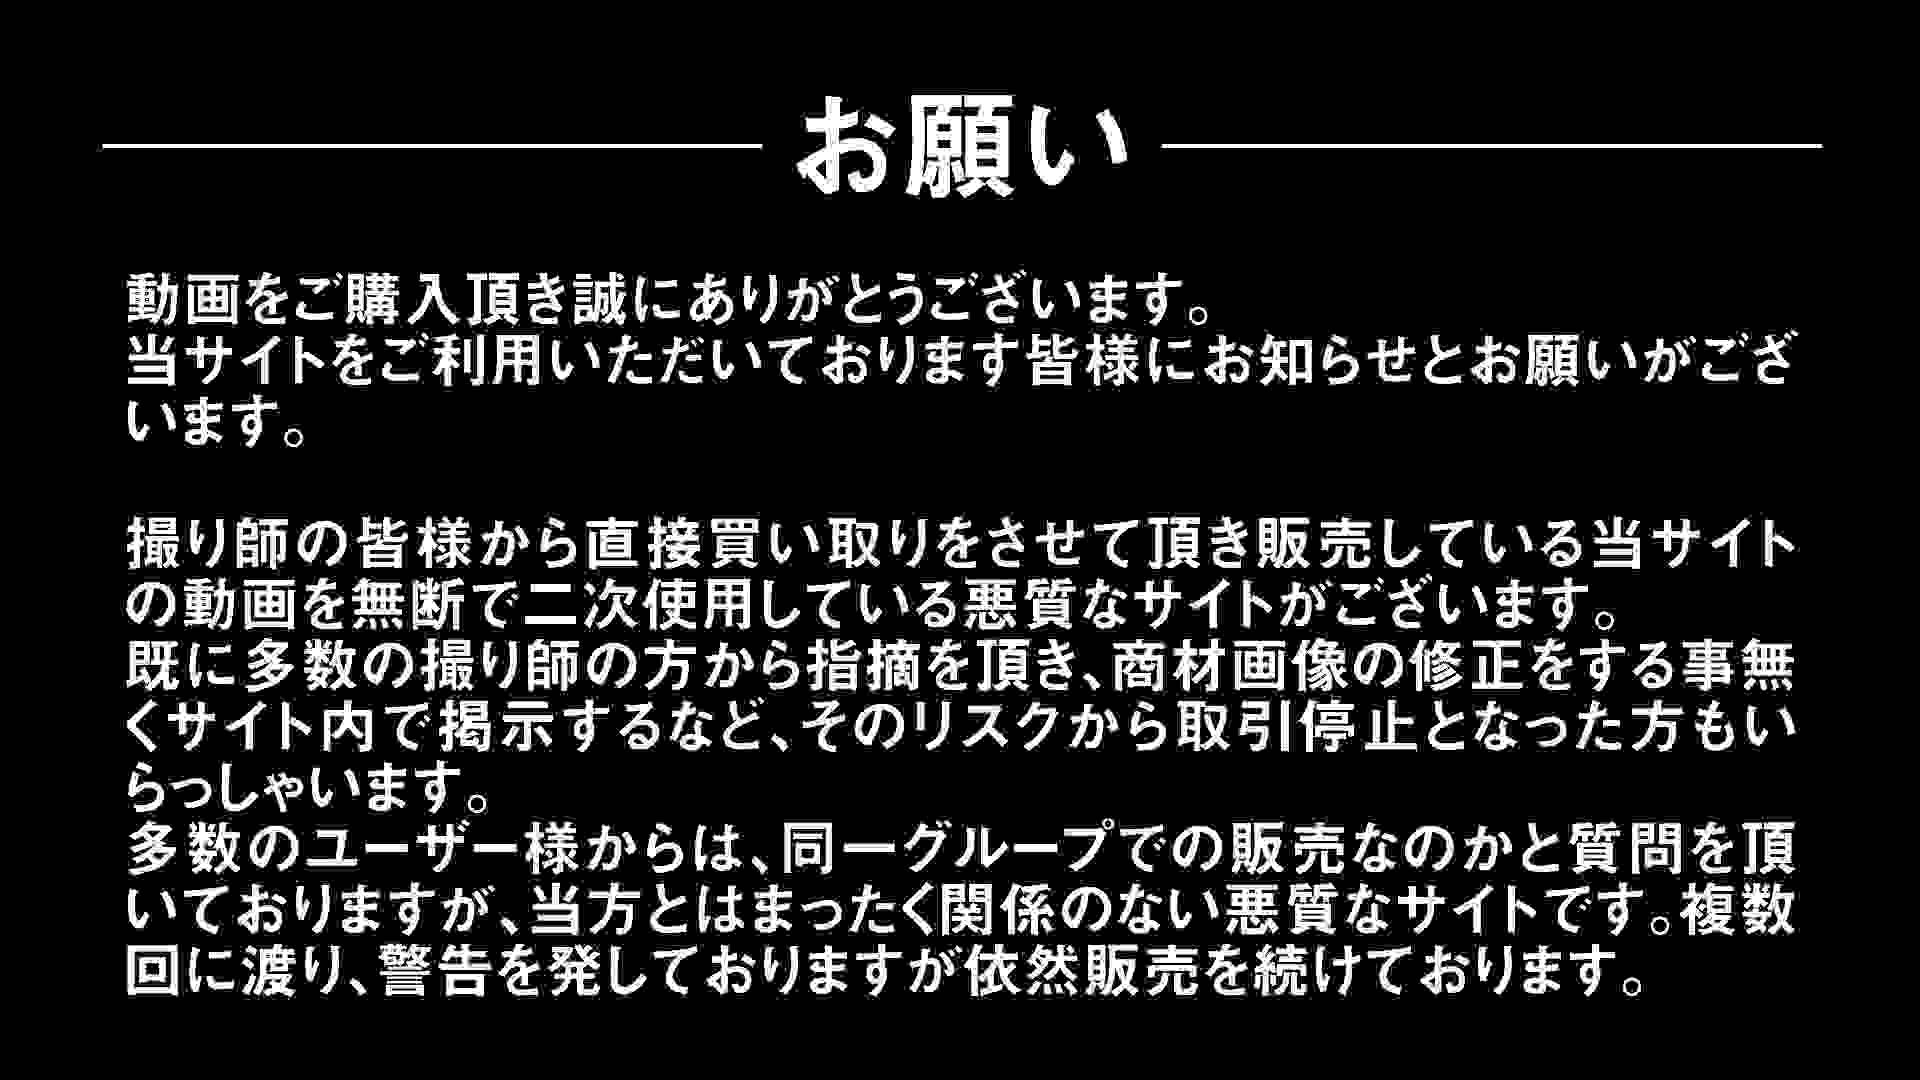 Aquaな露天風呂Vol.299 盗撮シリーズ | 露天風呂編  82PIX 5